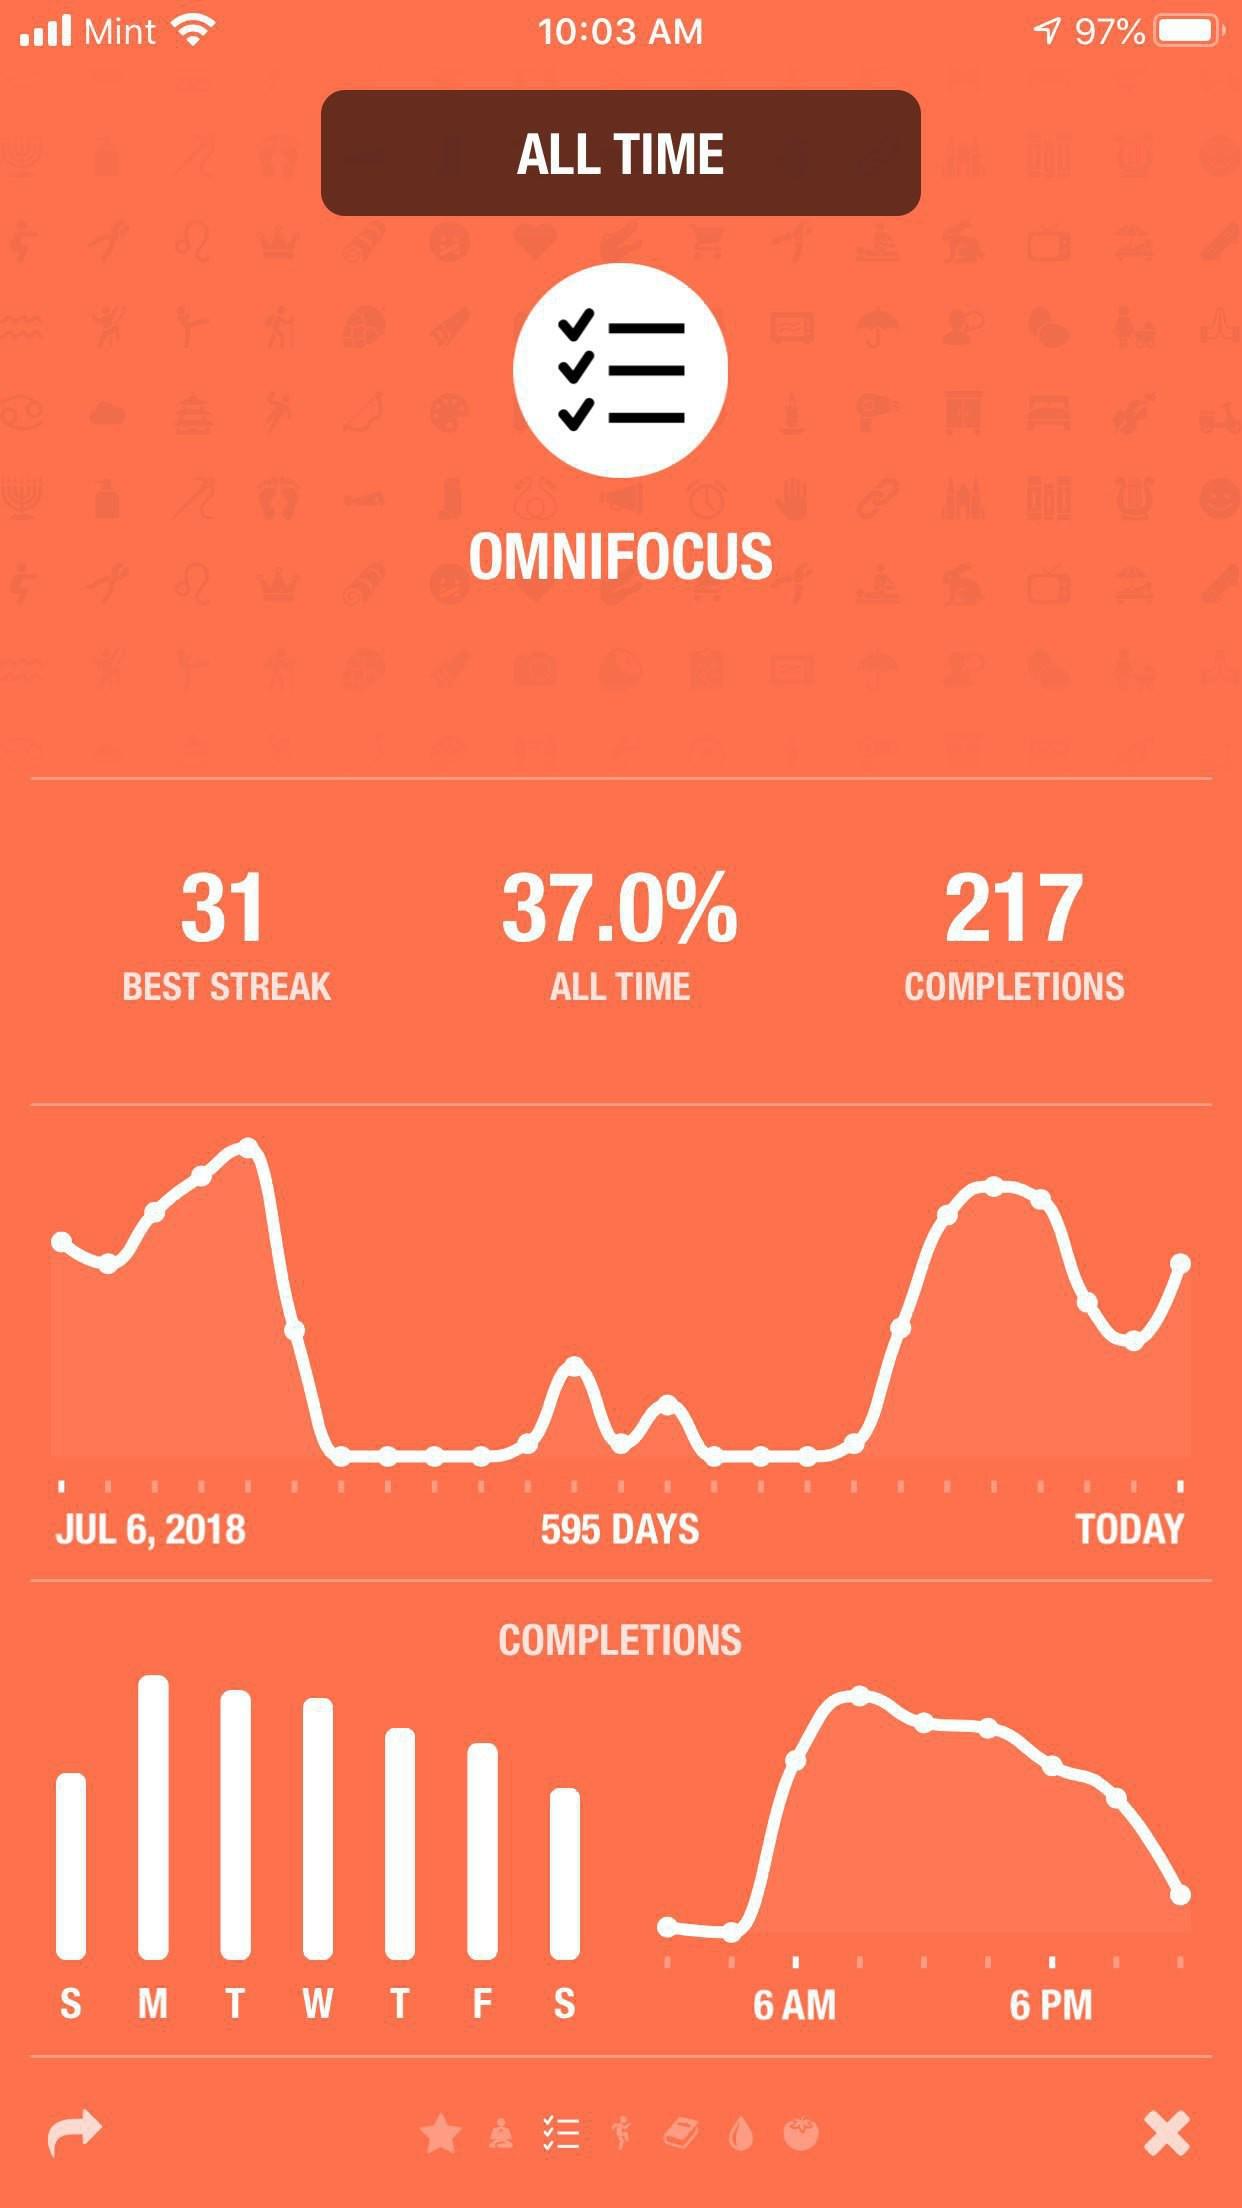 Omnifocus completion in streaks.